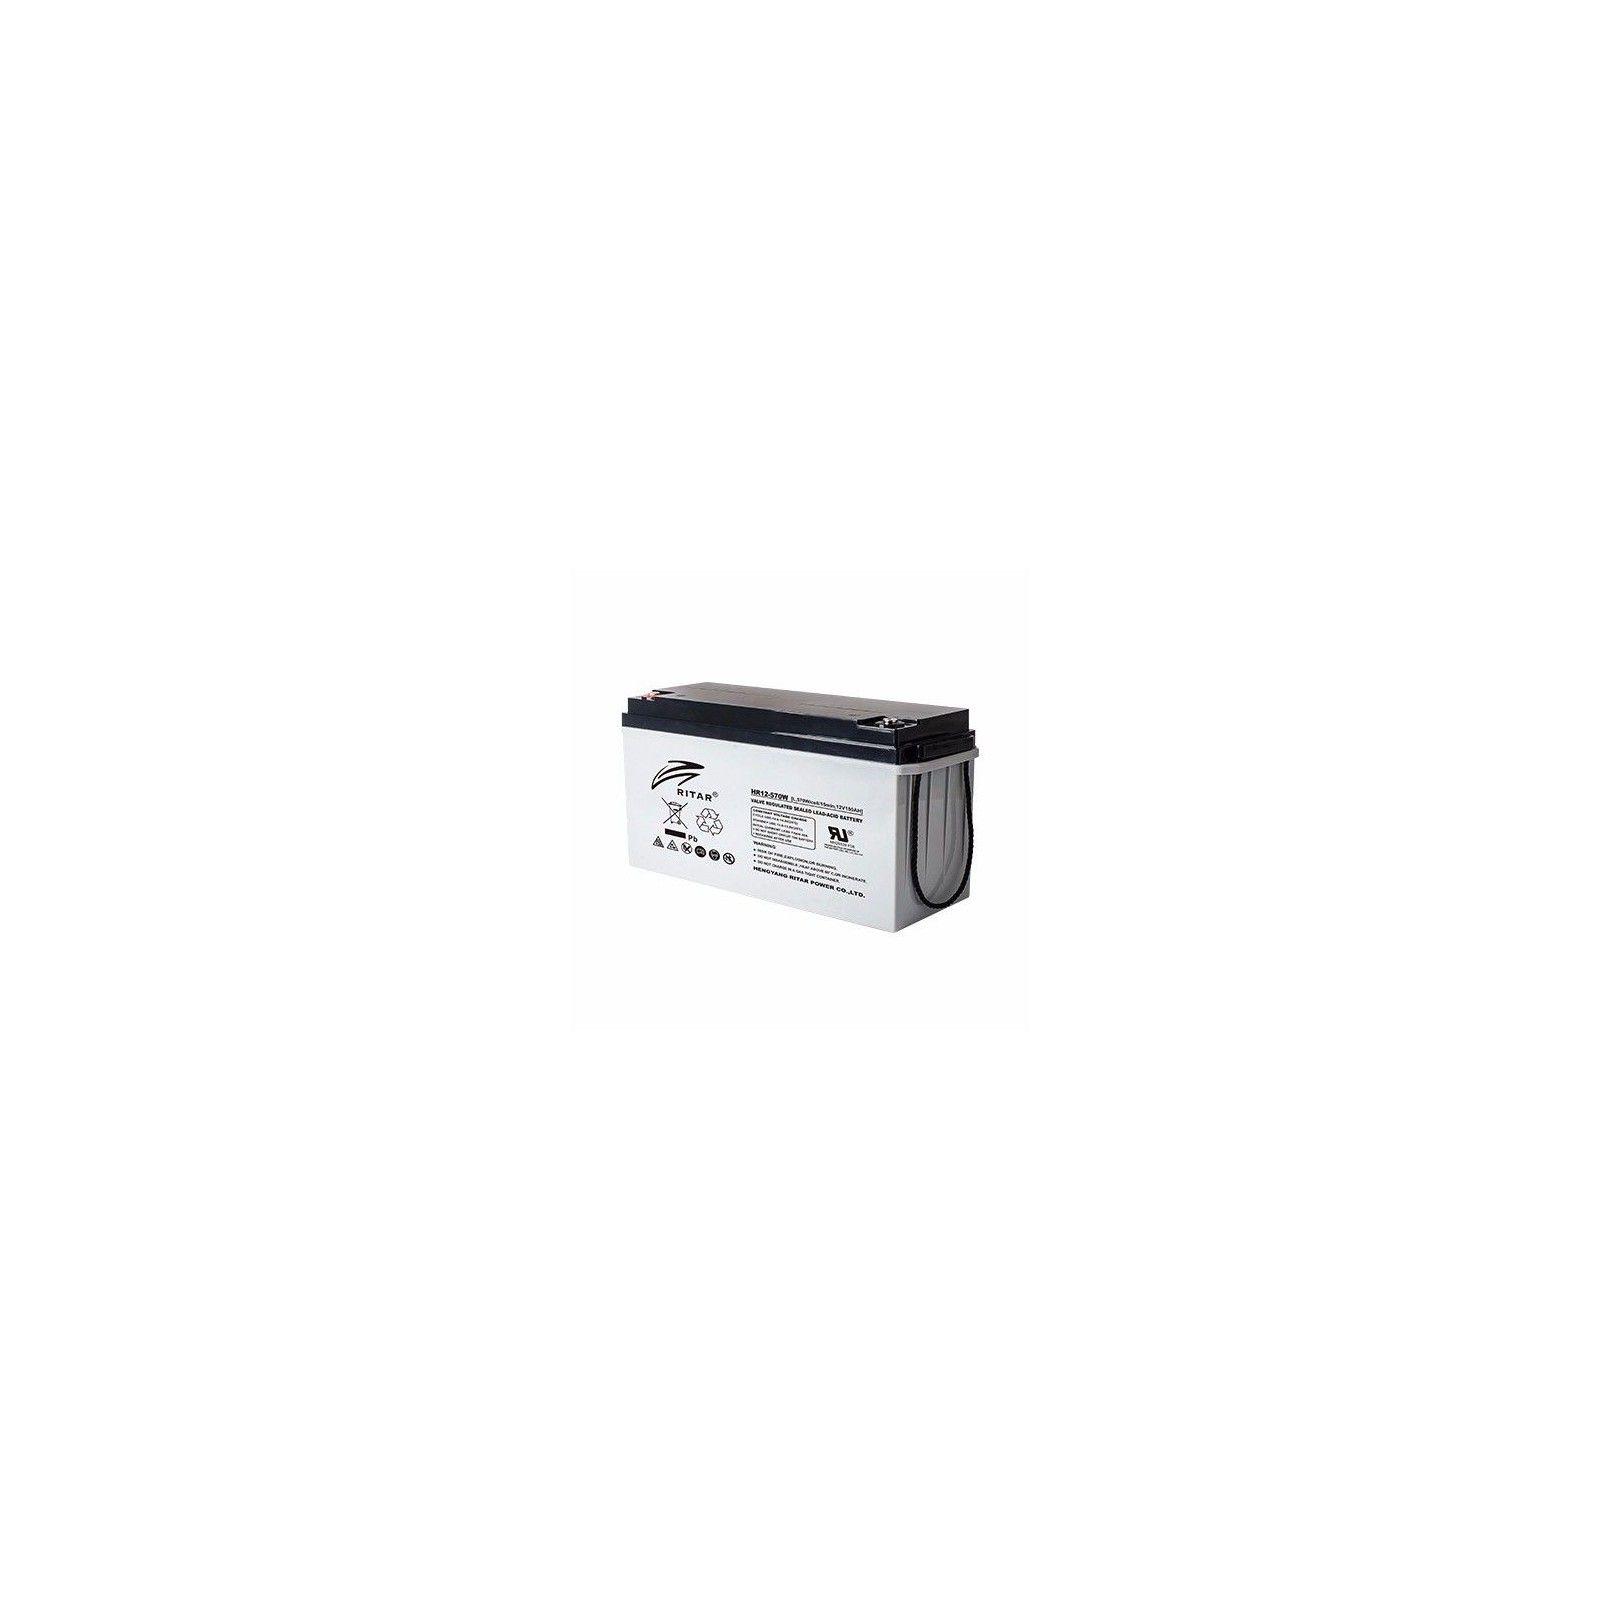 Batería Ritar HR12-96W 24Ah 12V Hr RITAR - 1